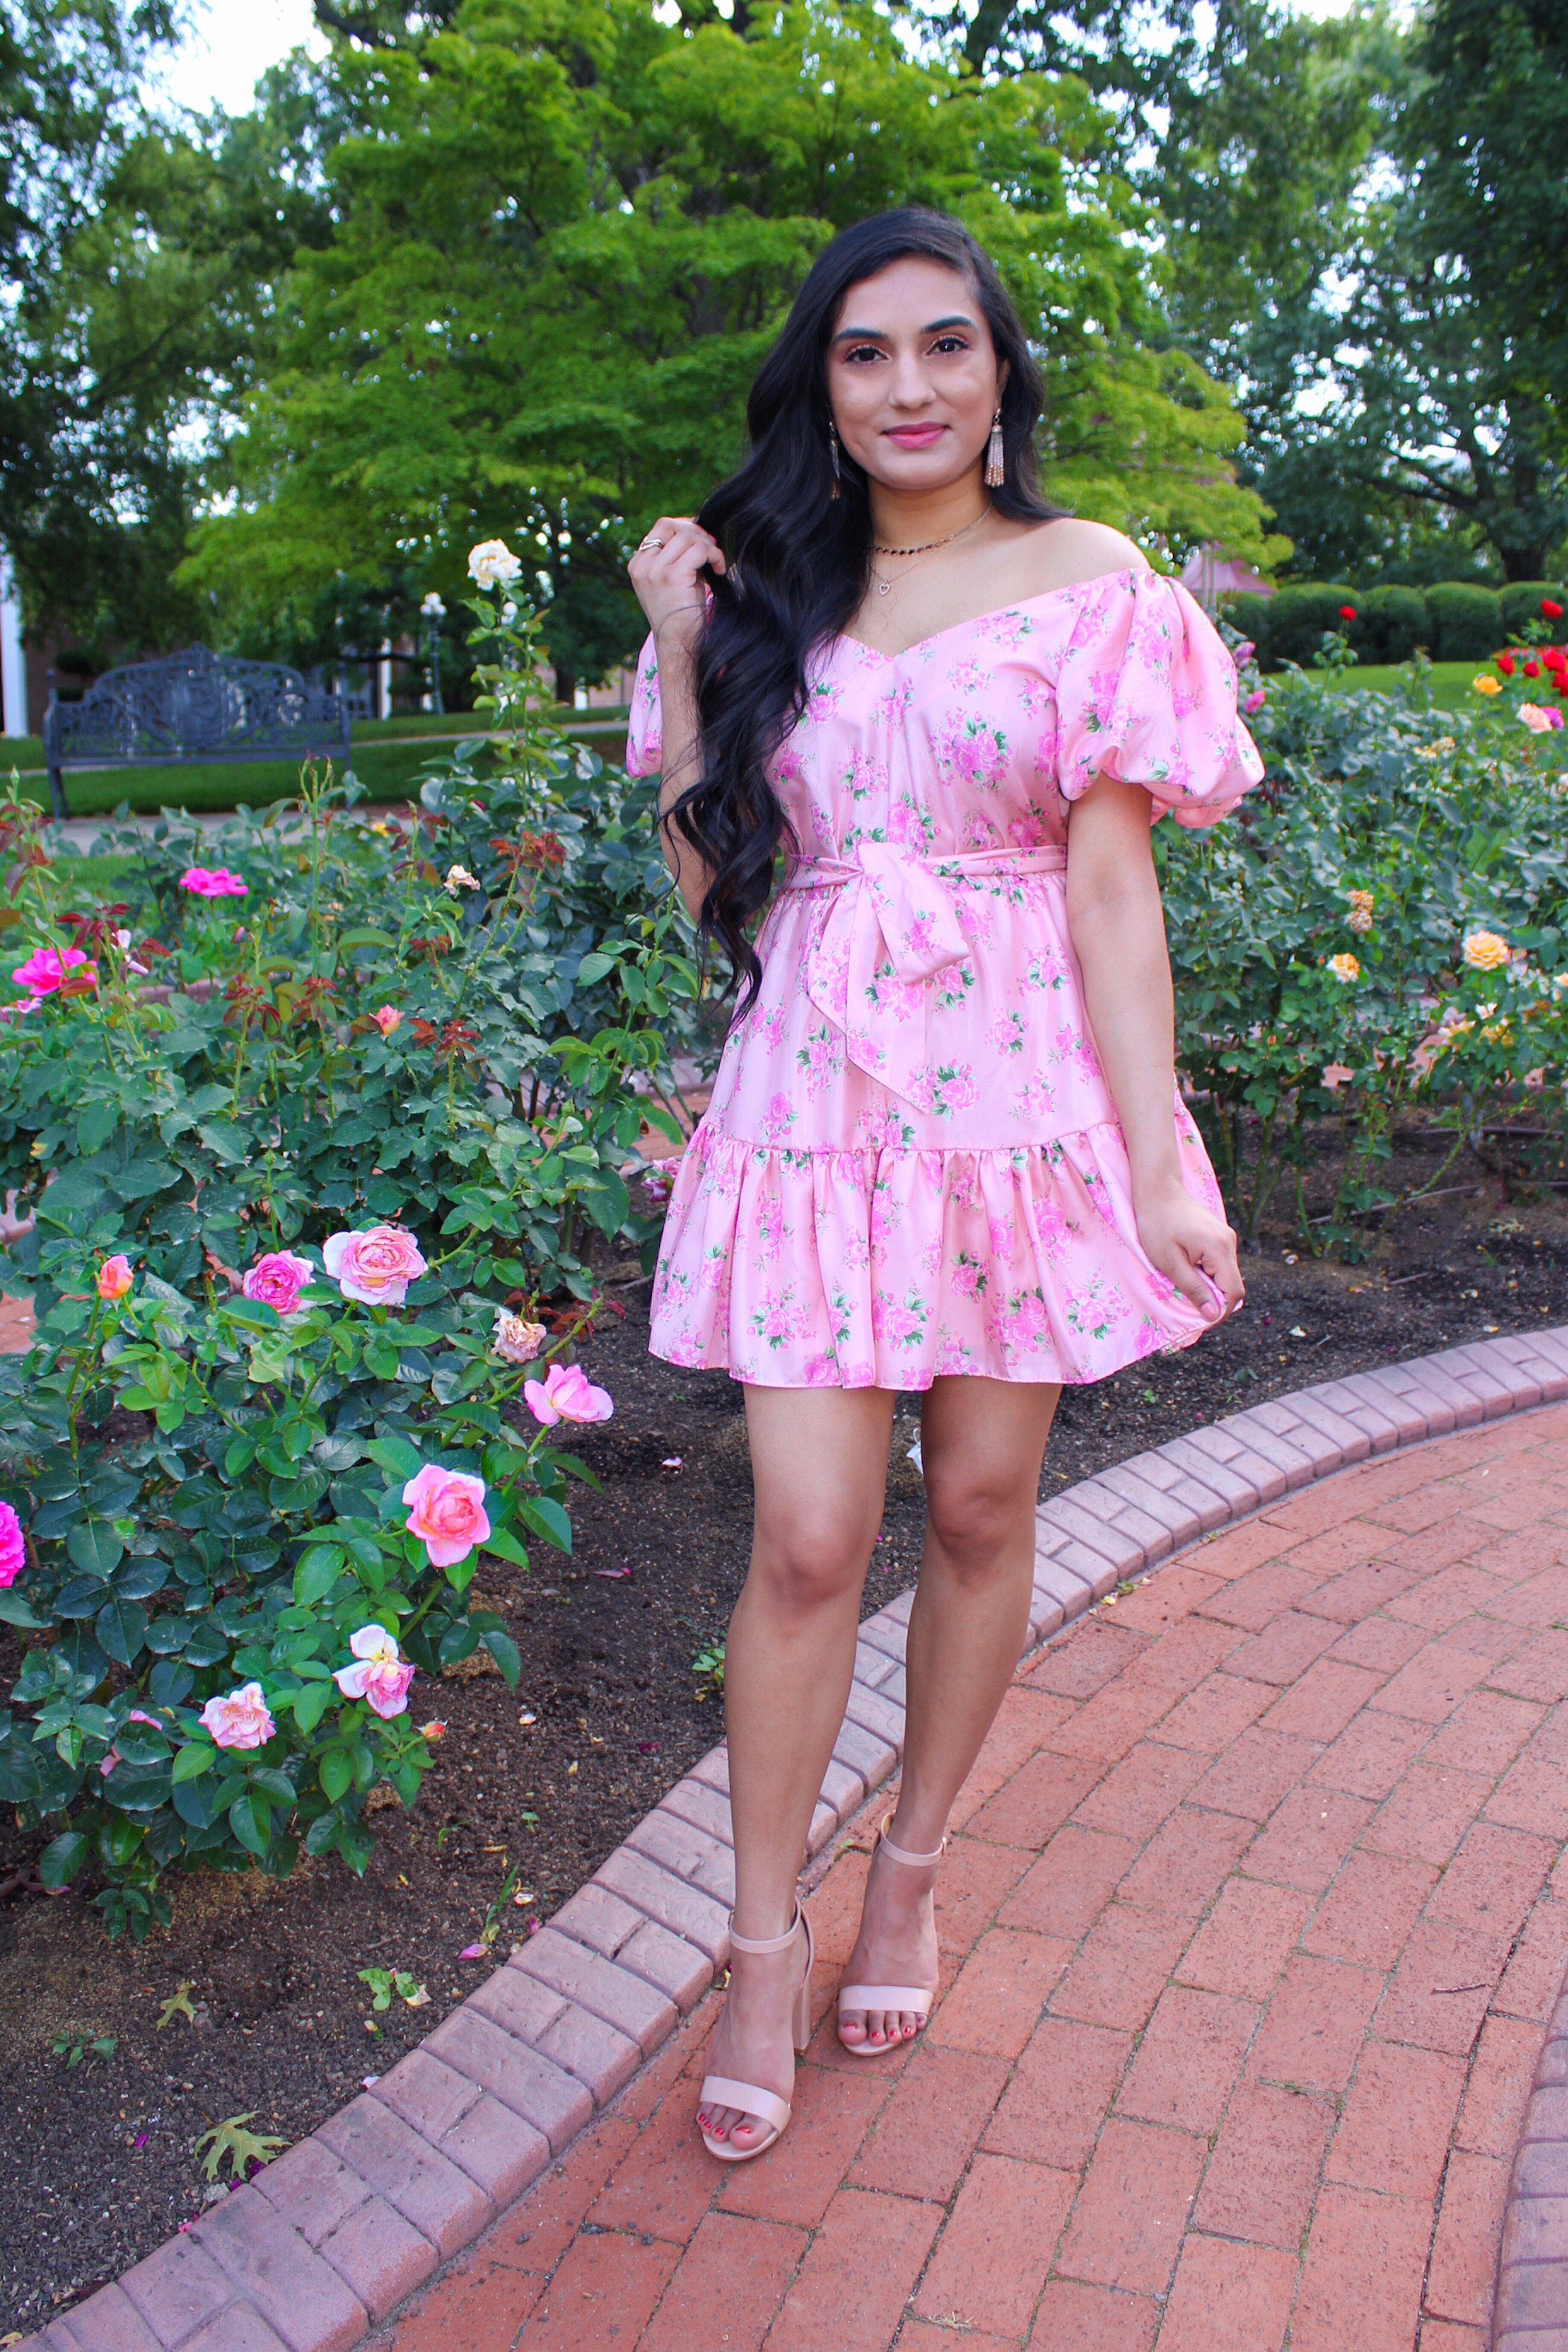 Loveshackfancy X Target Pink Floral Puff Sleeve Dress In 2021 Target Dress Dresses Puffed Sleeves Dress [ 5511 x 3674 Pixel ]